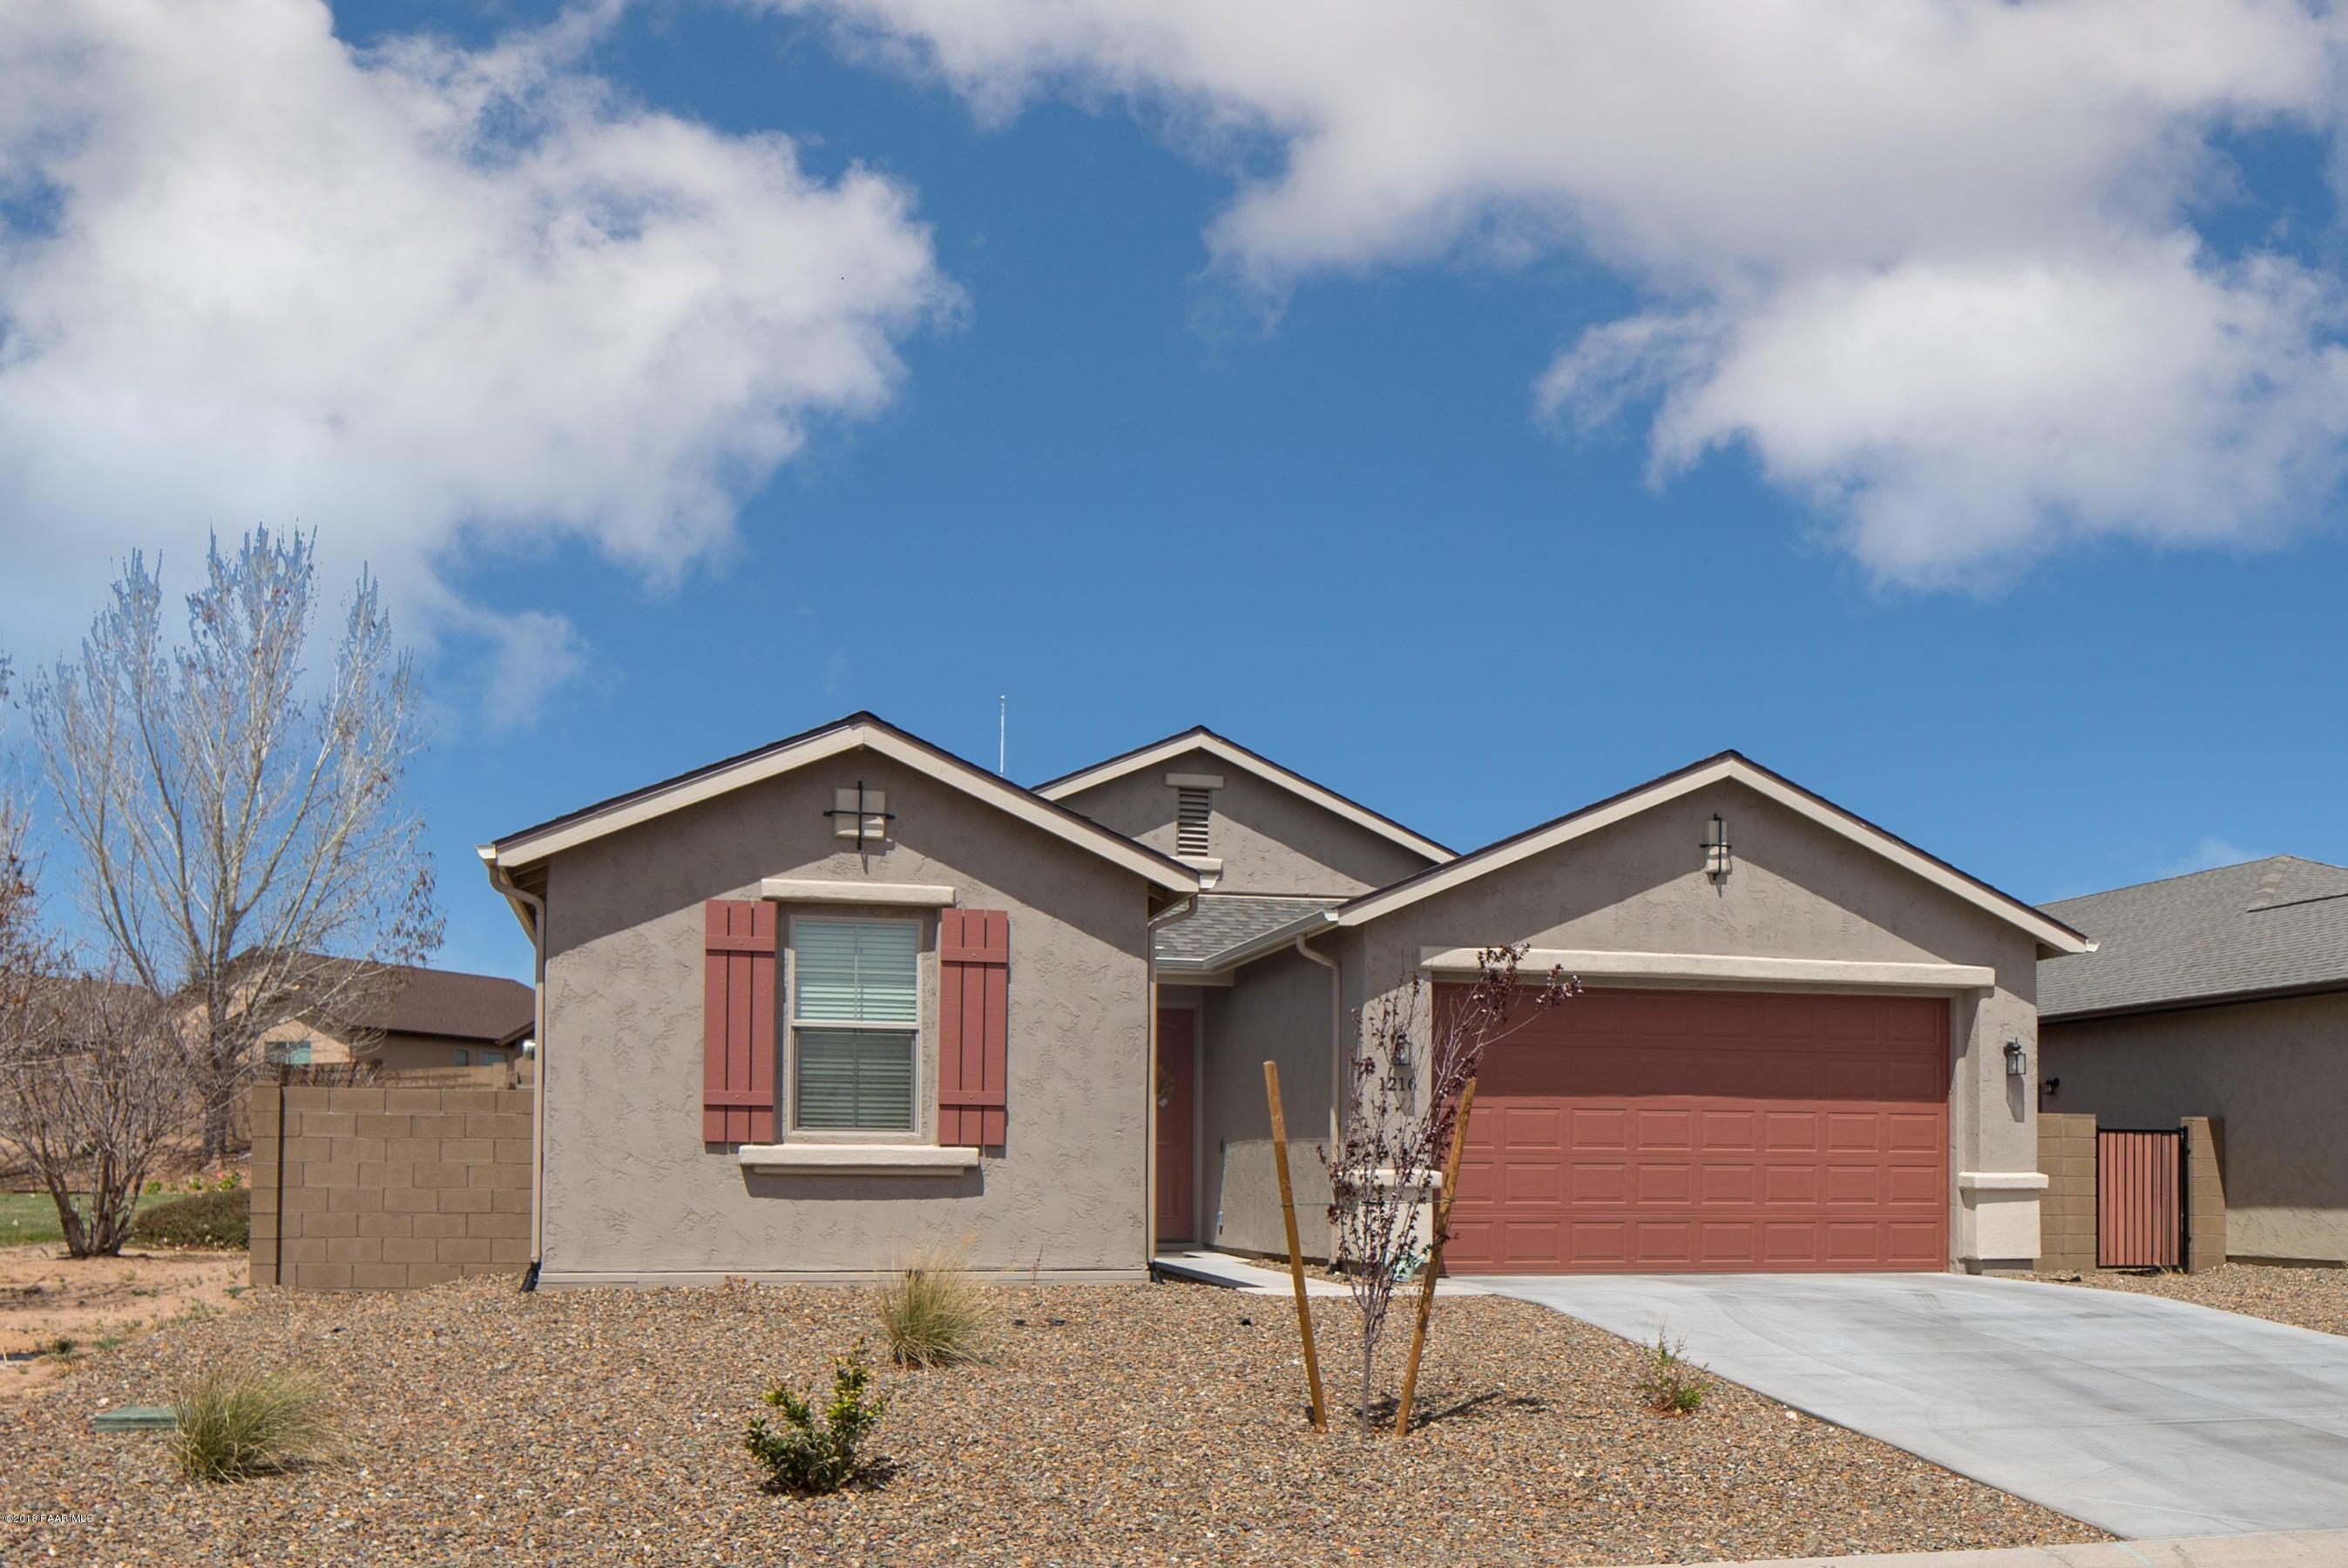 1216 Brentwood Way, Chino Valley, AZ 86323